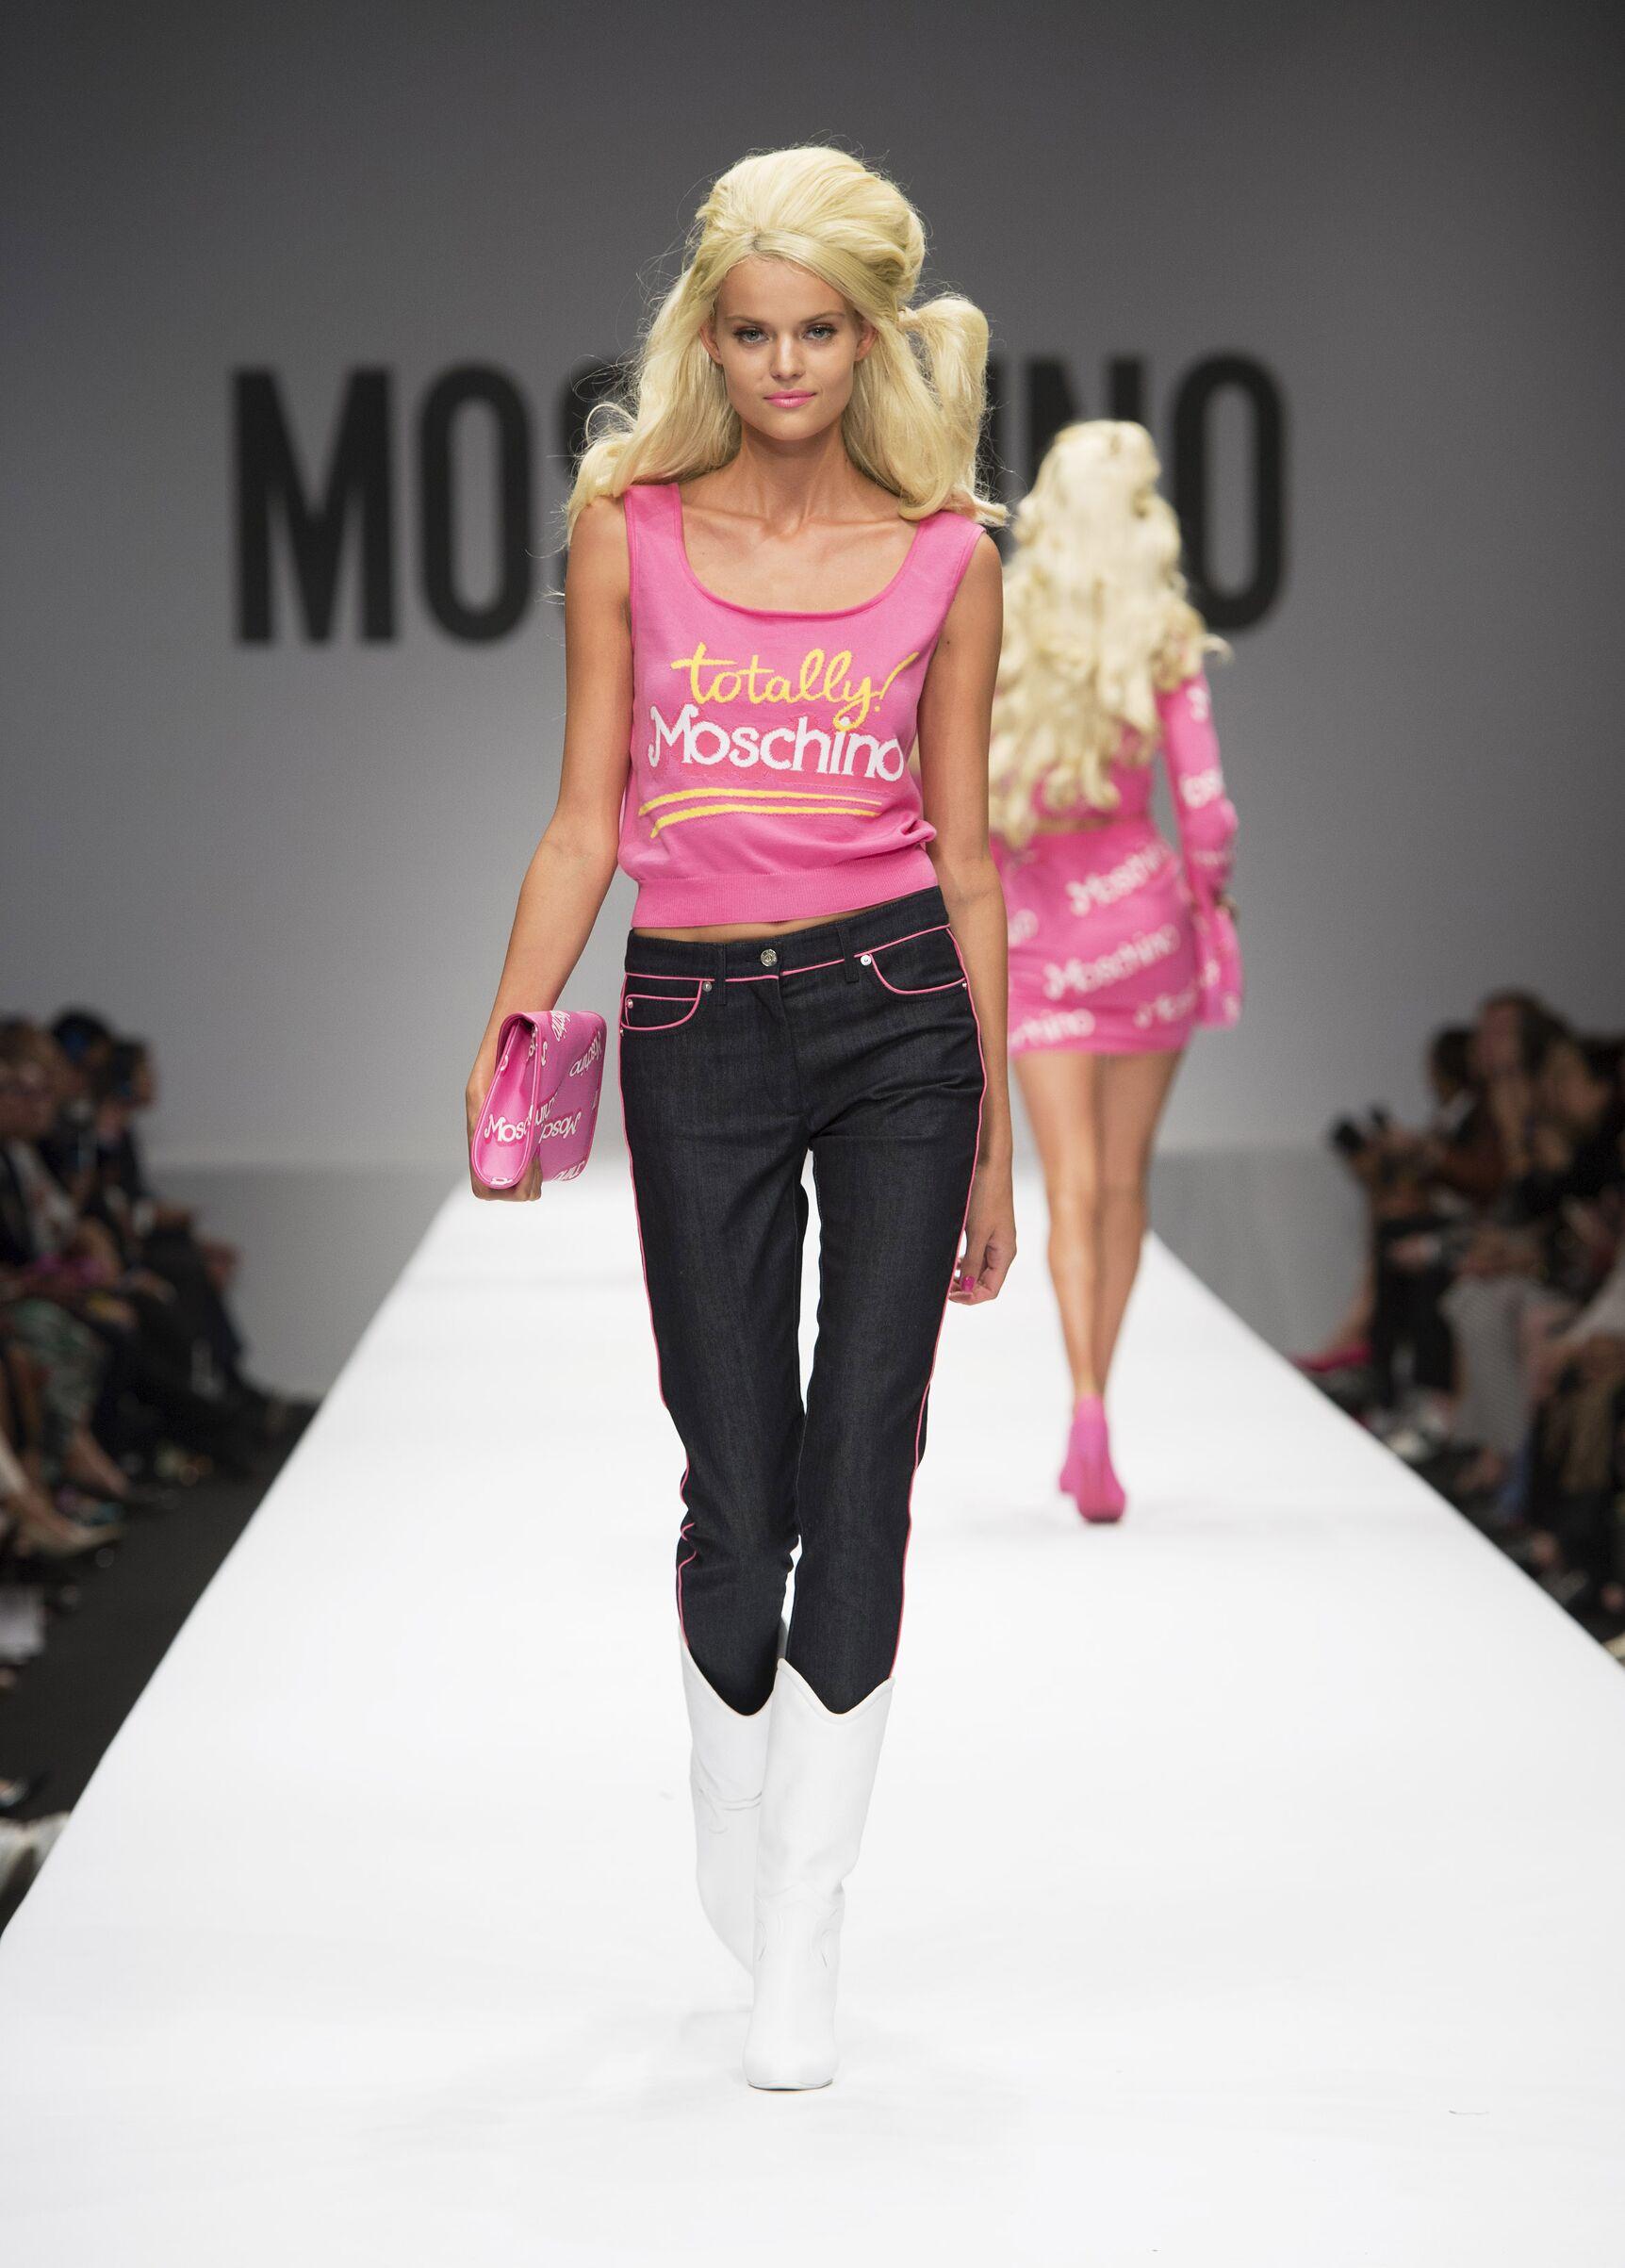 Summer 2015 Fashion Show Moschino Barbie by Jeremy Scott